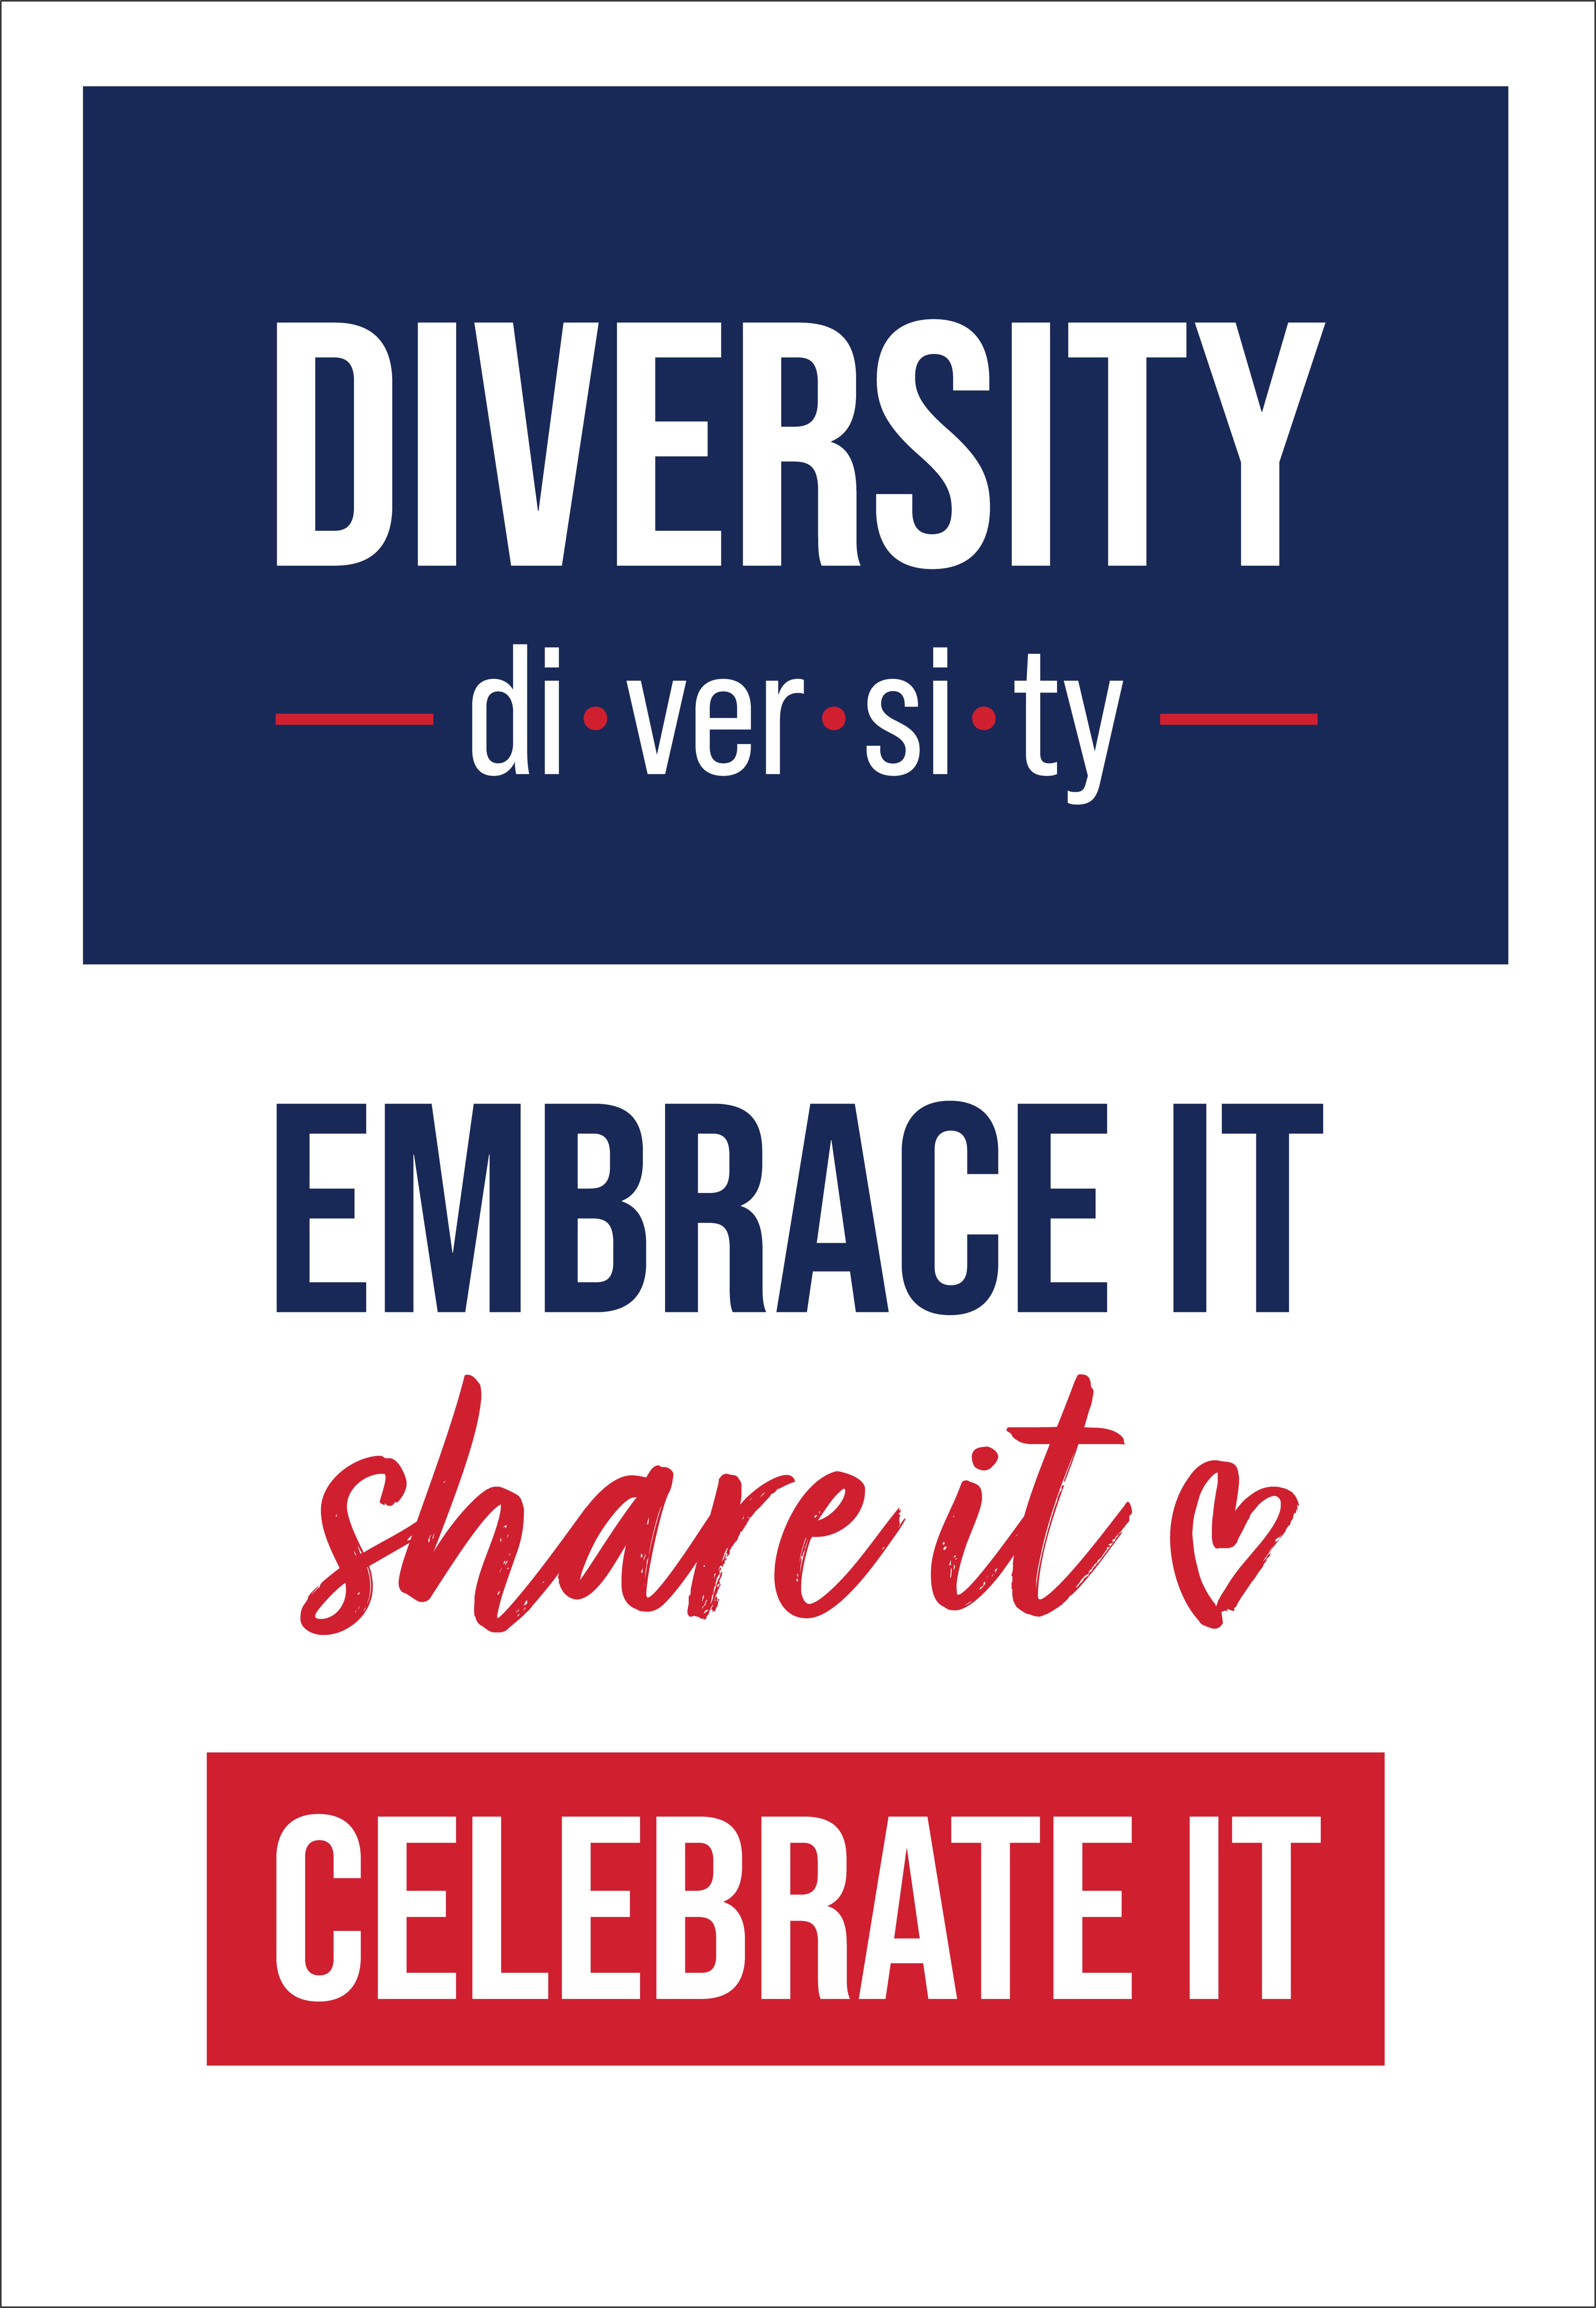 Diversity Banners_36x54_Final_Embrace Diversity (1)